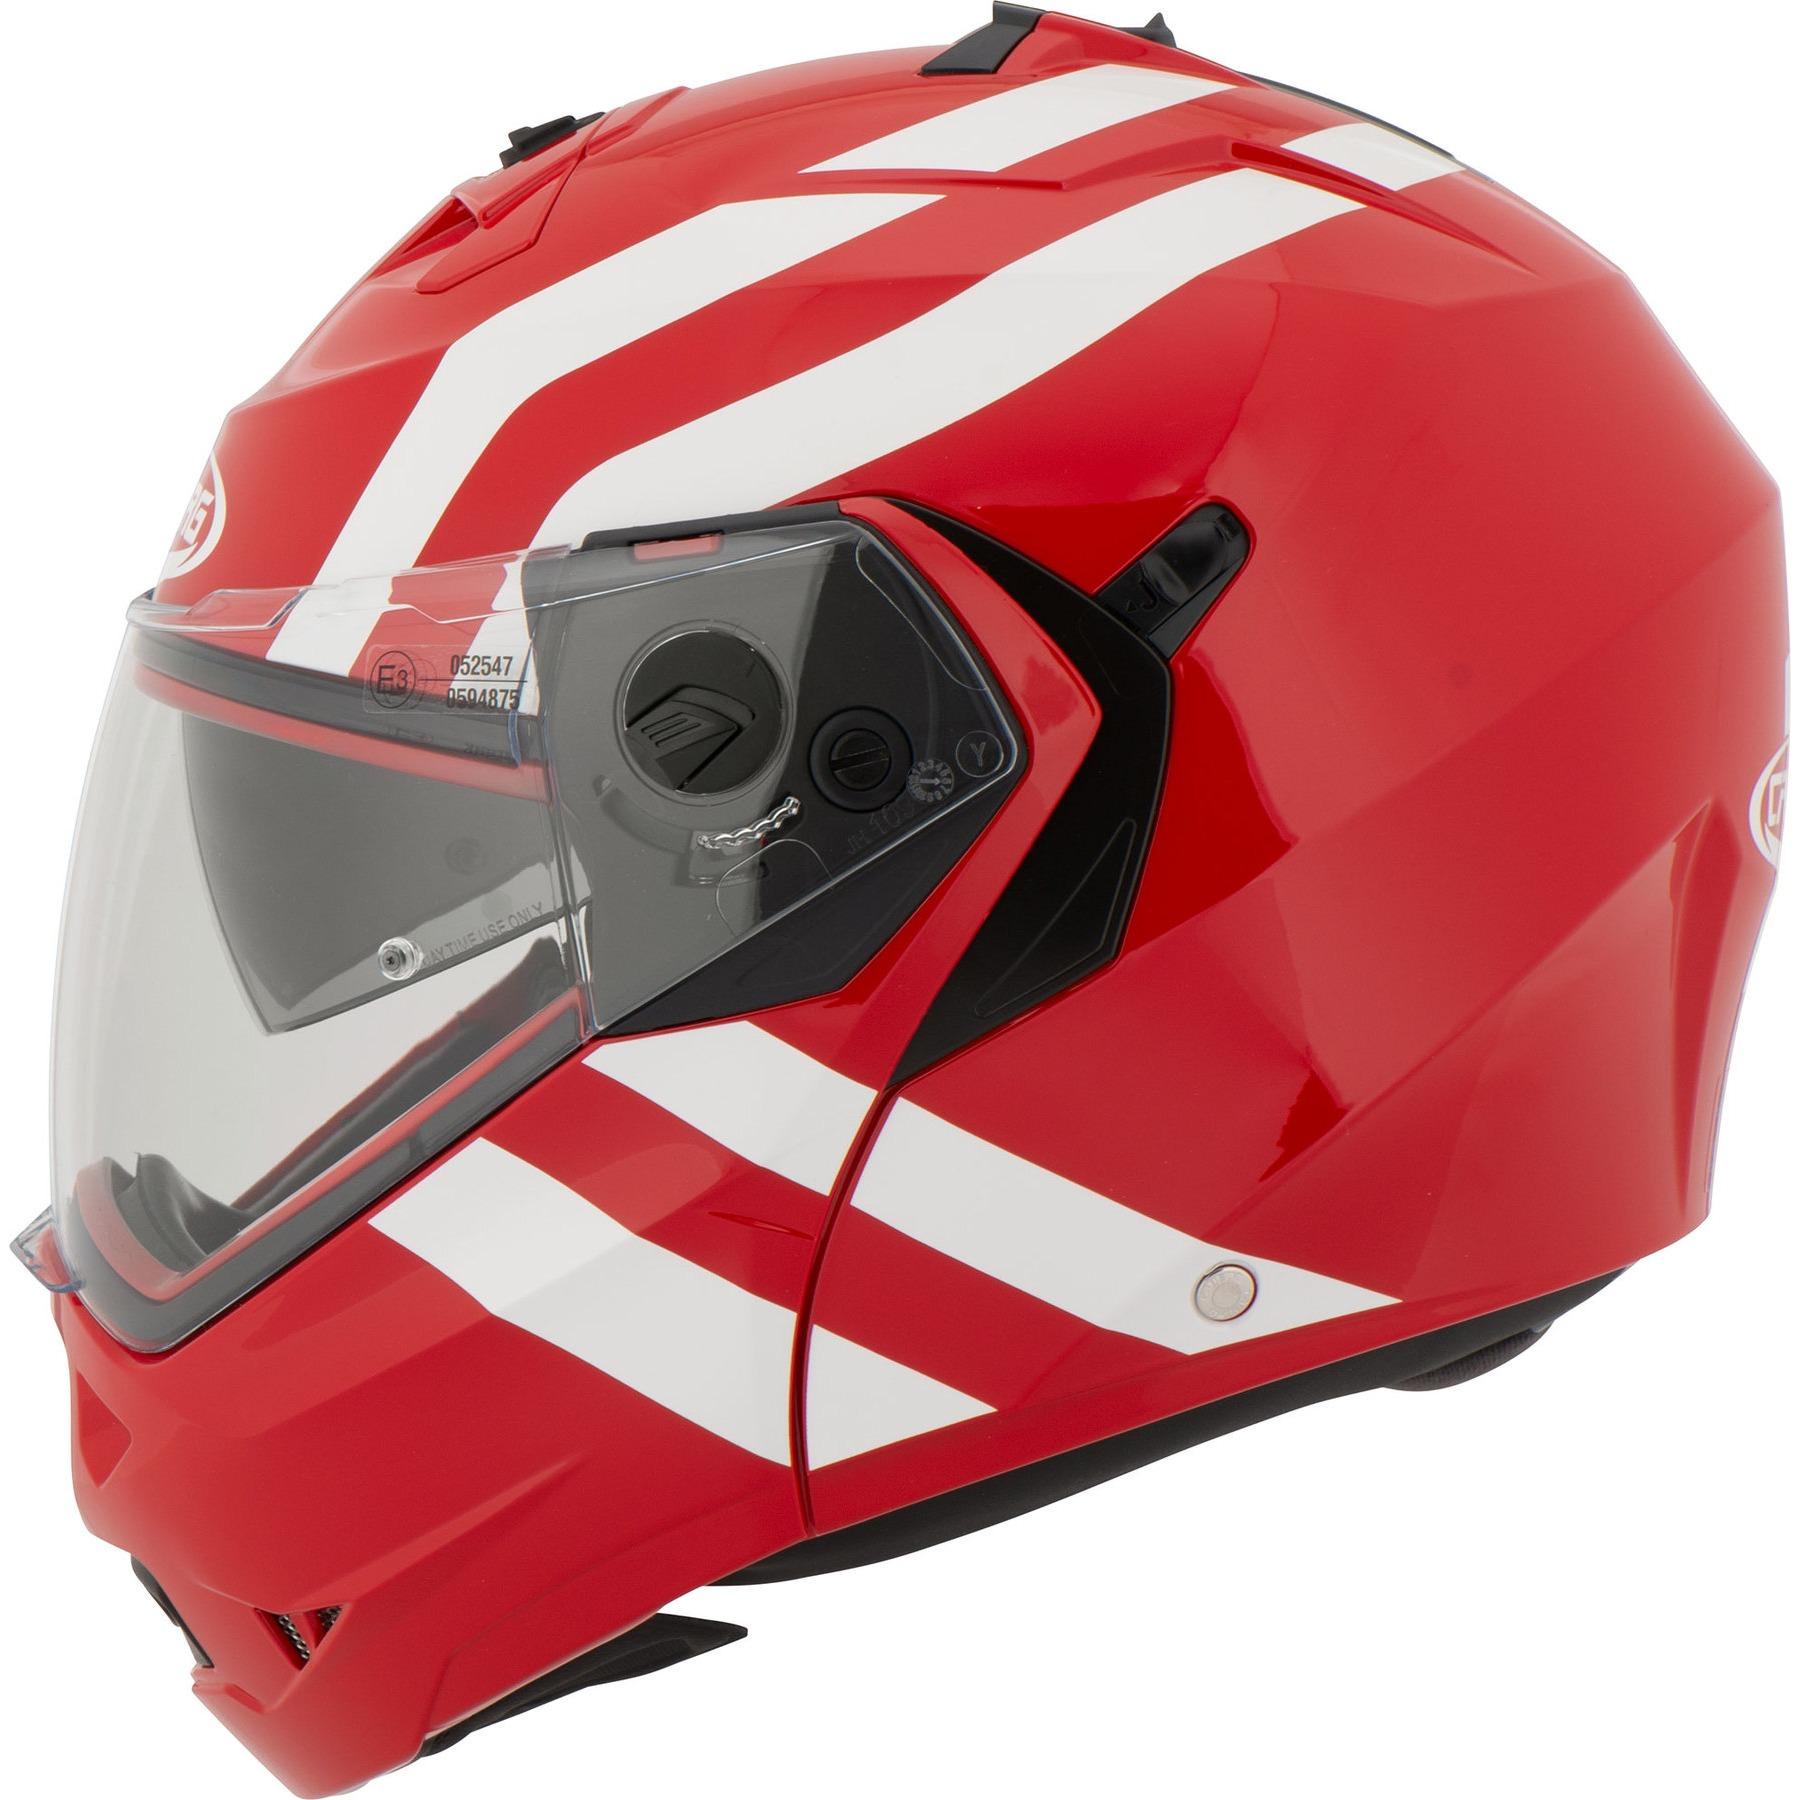 Caberg Visor Mounting Kit Replacement For Moto Motorcycle Motorbike Duke Helmets